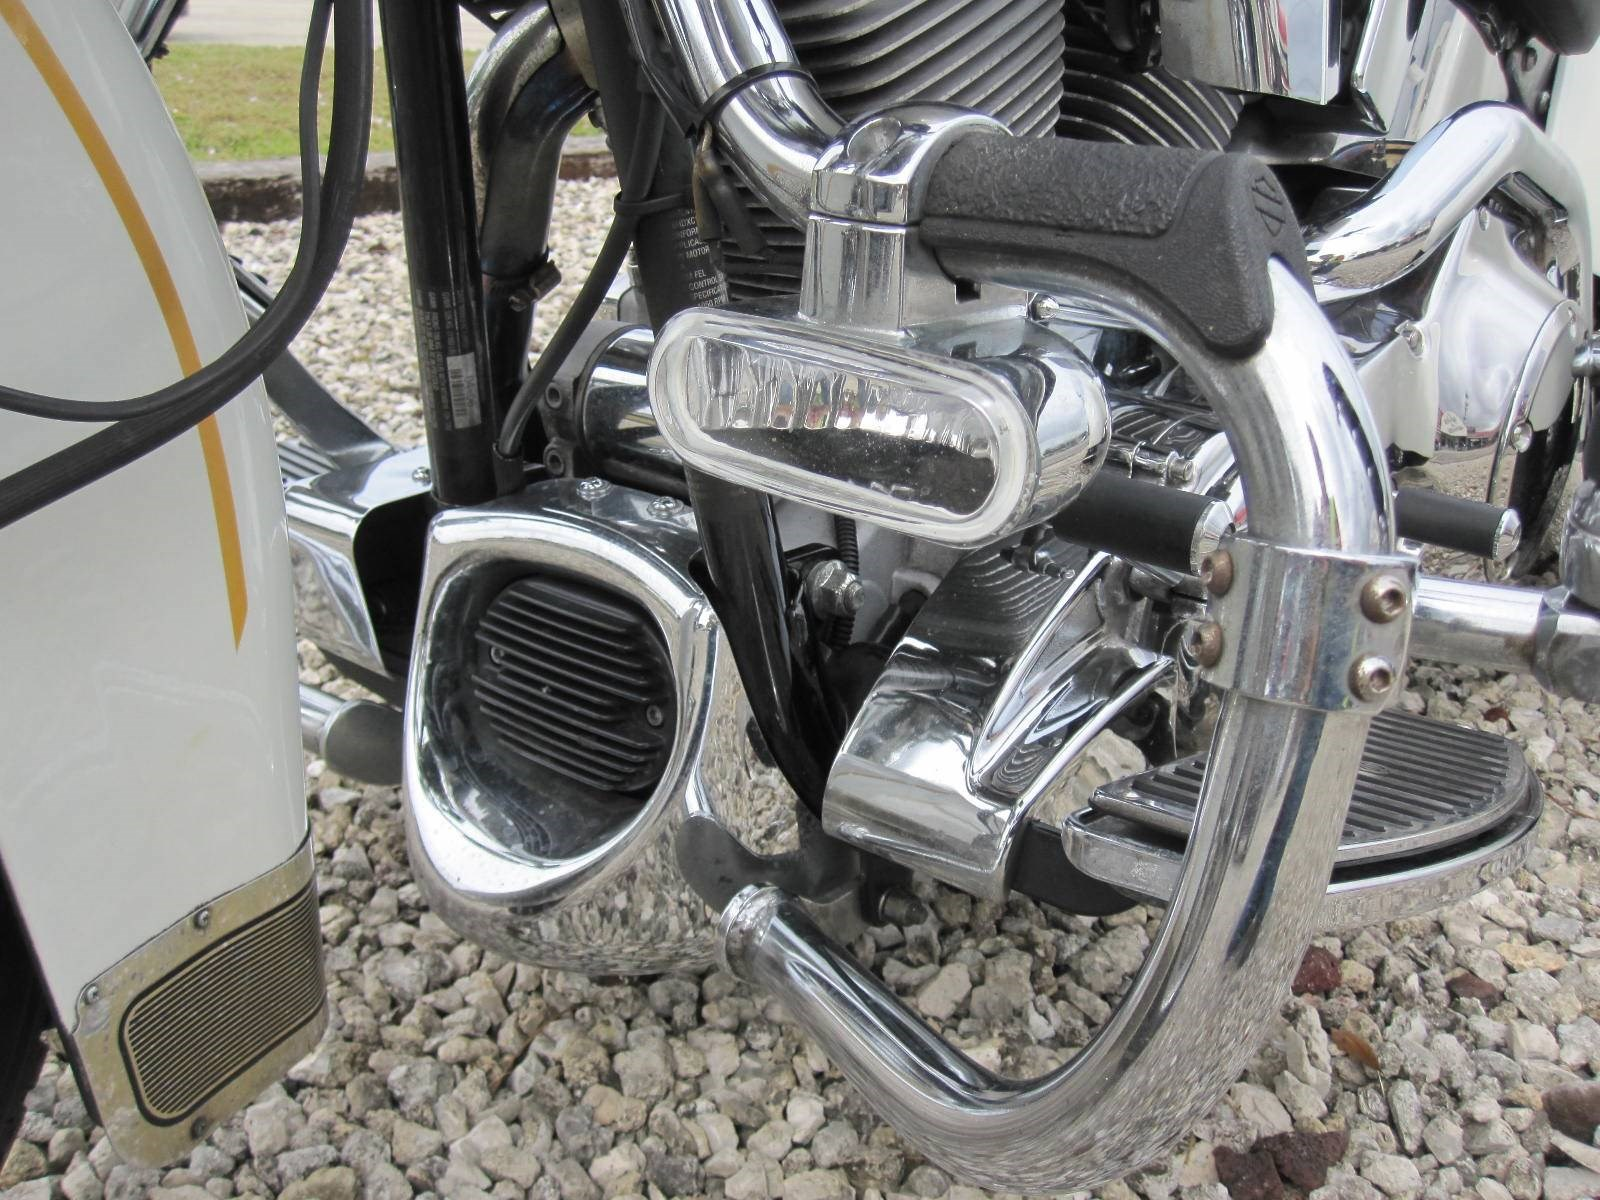 Dft Trikes Dft Home >> 2006 Harley-Davidson® FLST/I Heritage Softail® (White), Fort Myers, Florida (742053 ...